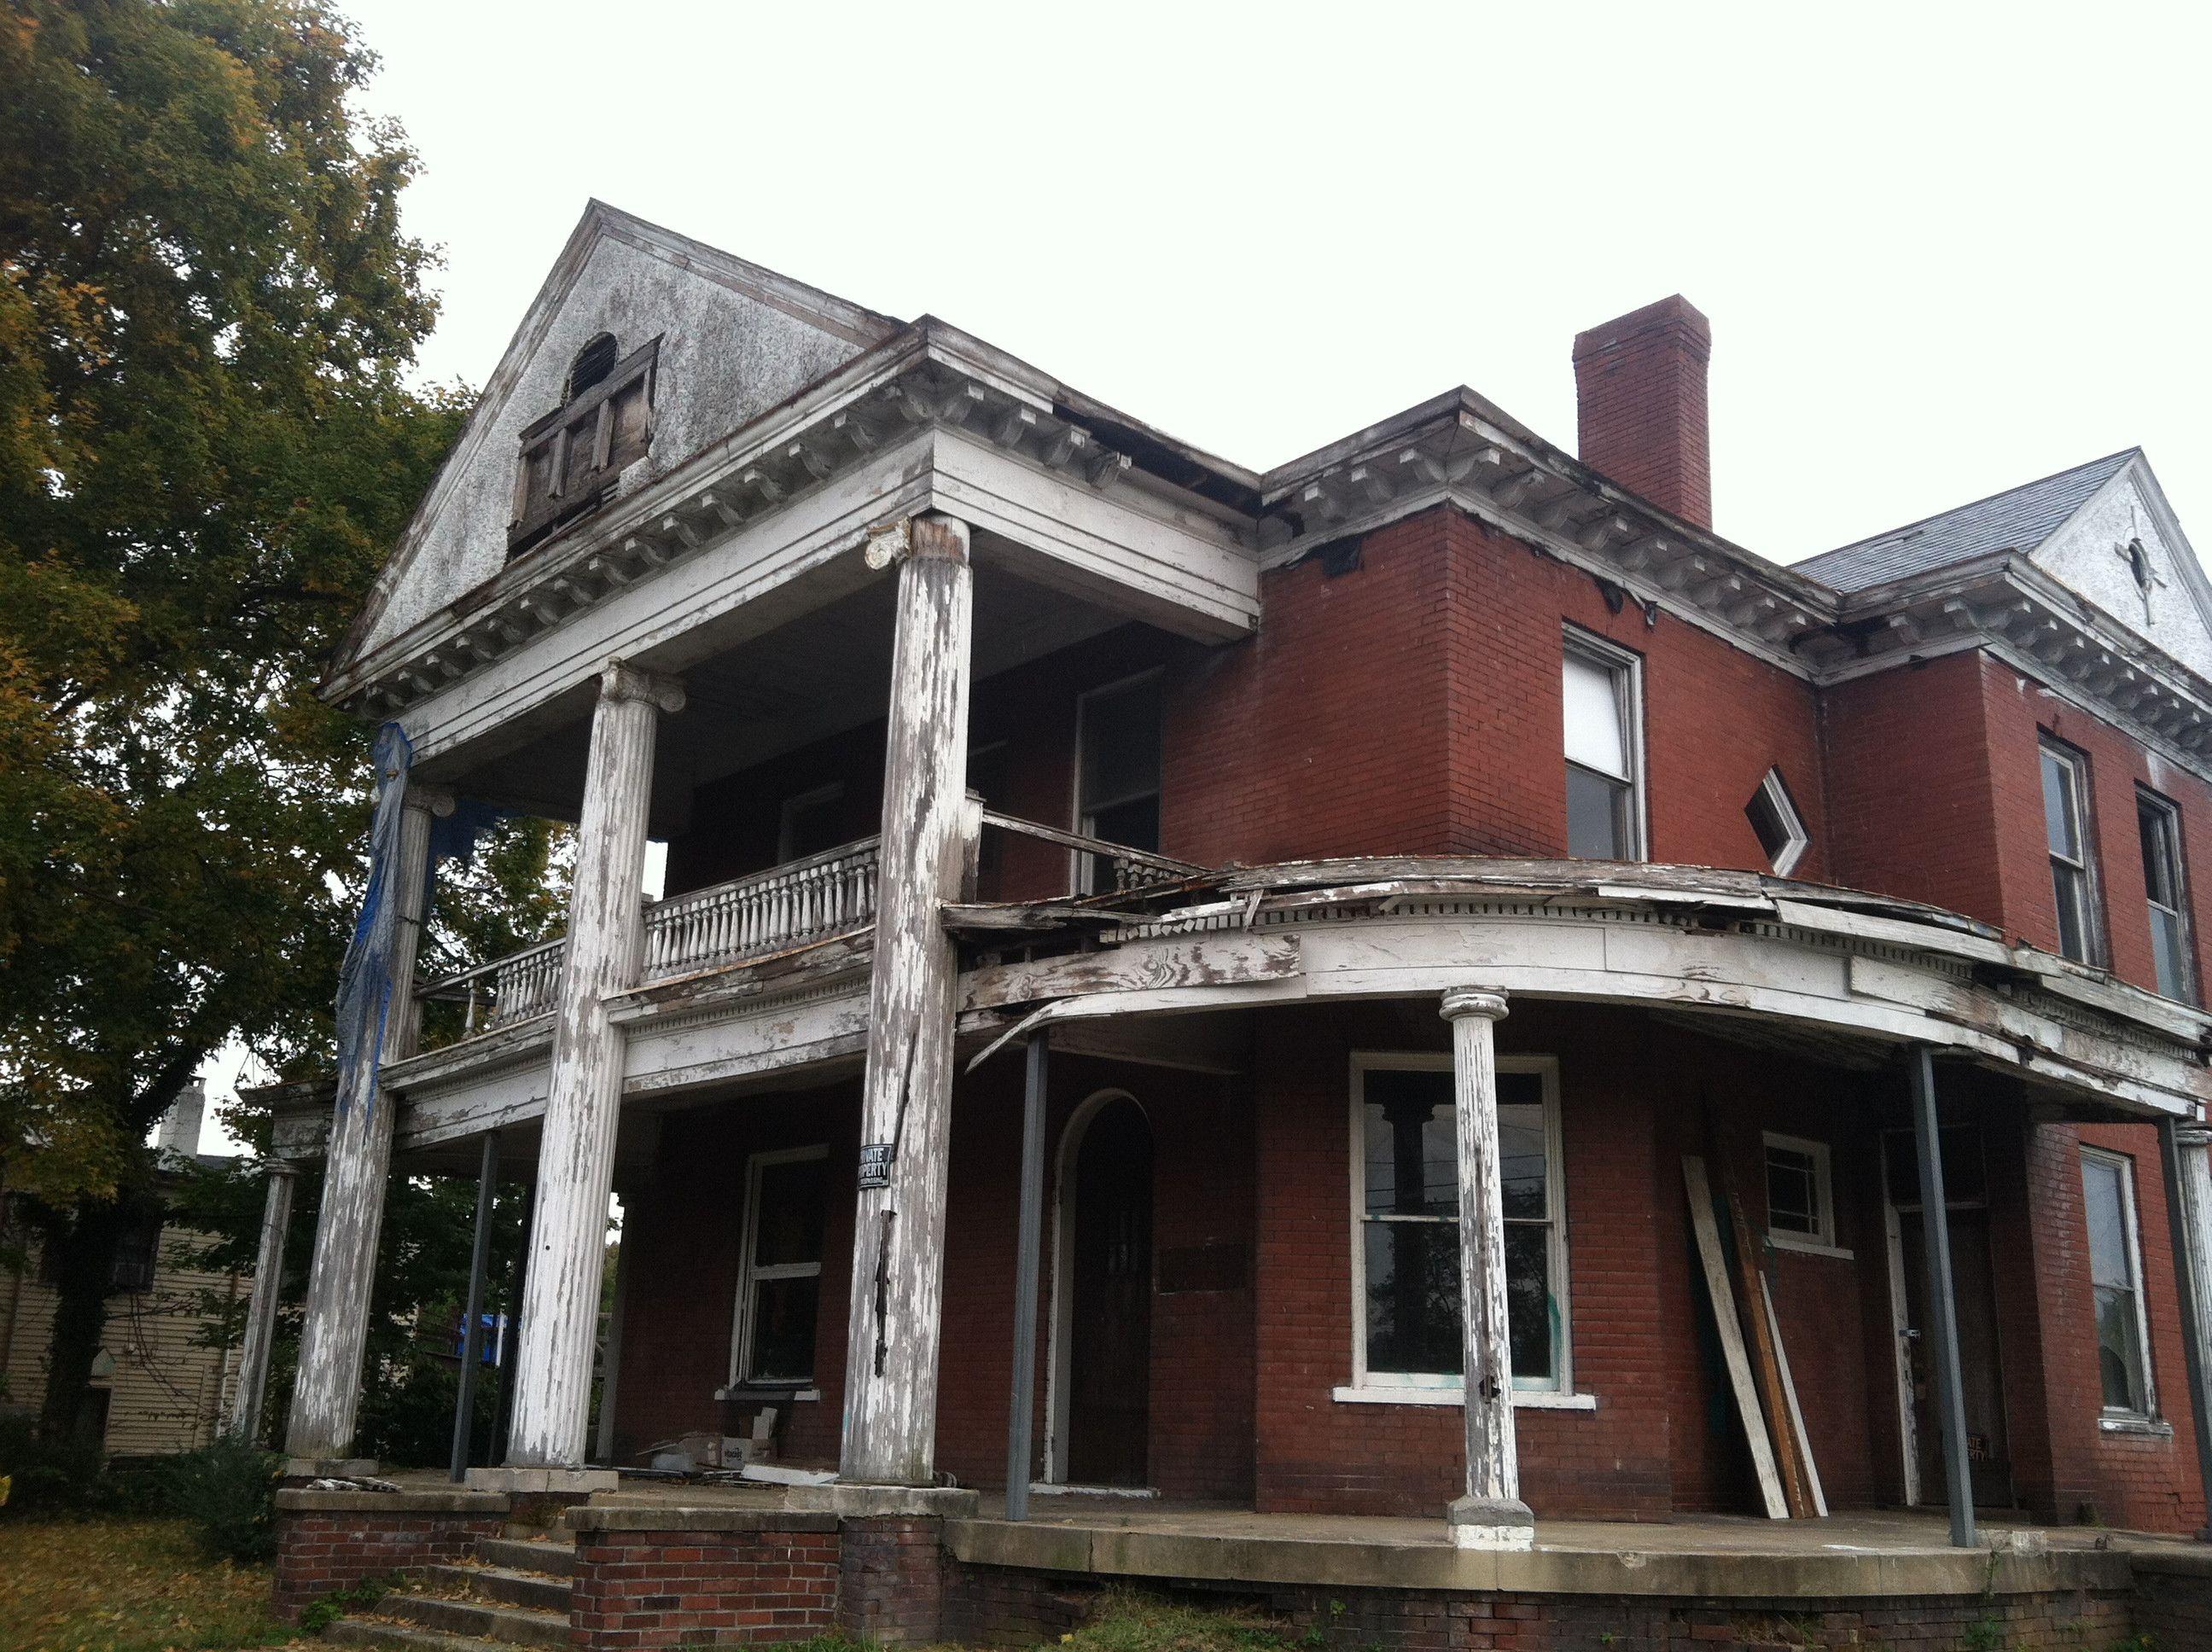 Abandoned house in Bristol, VA found on reddit http//www